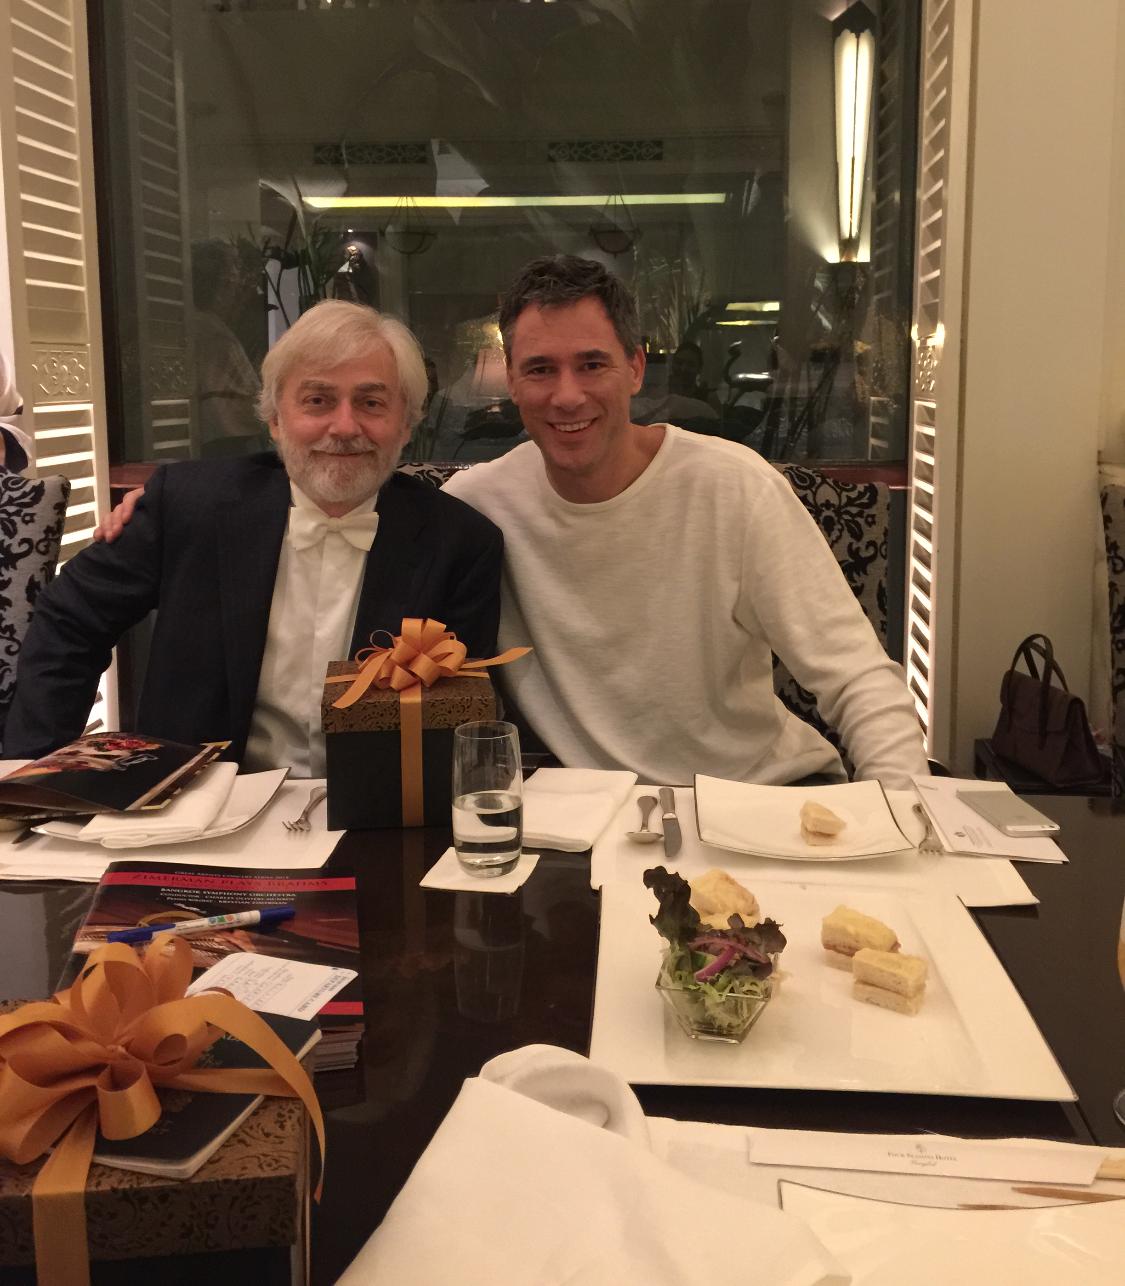 With Krystian Zimerman in Bangkok